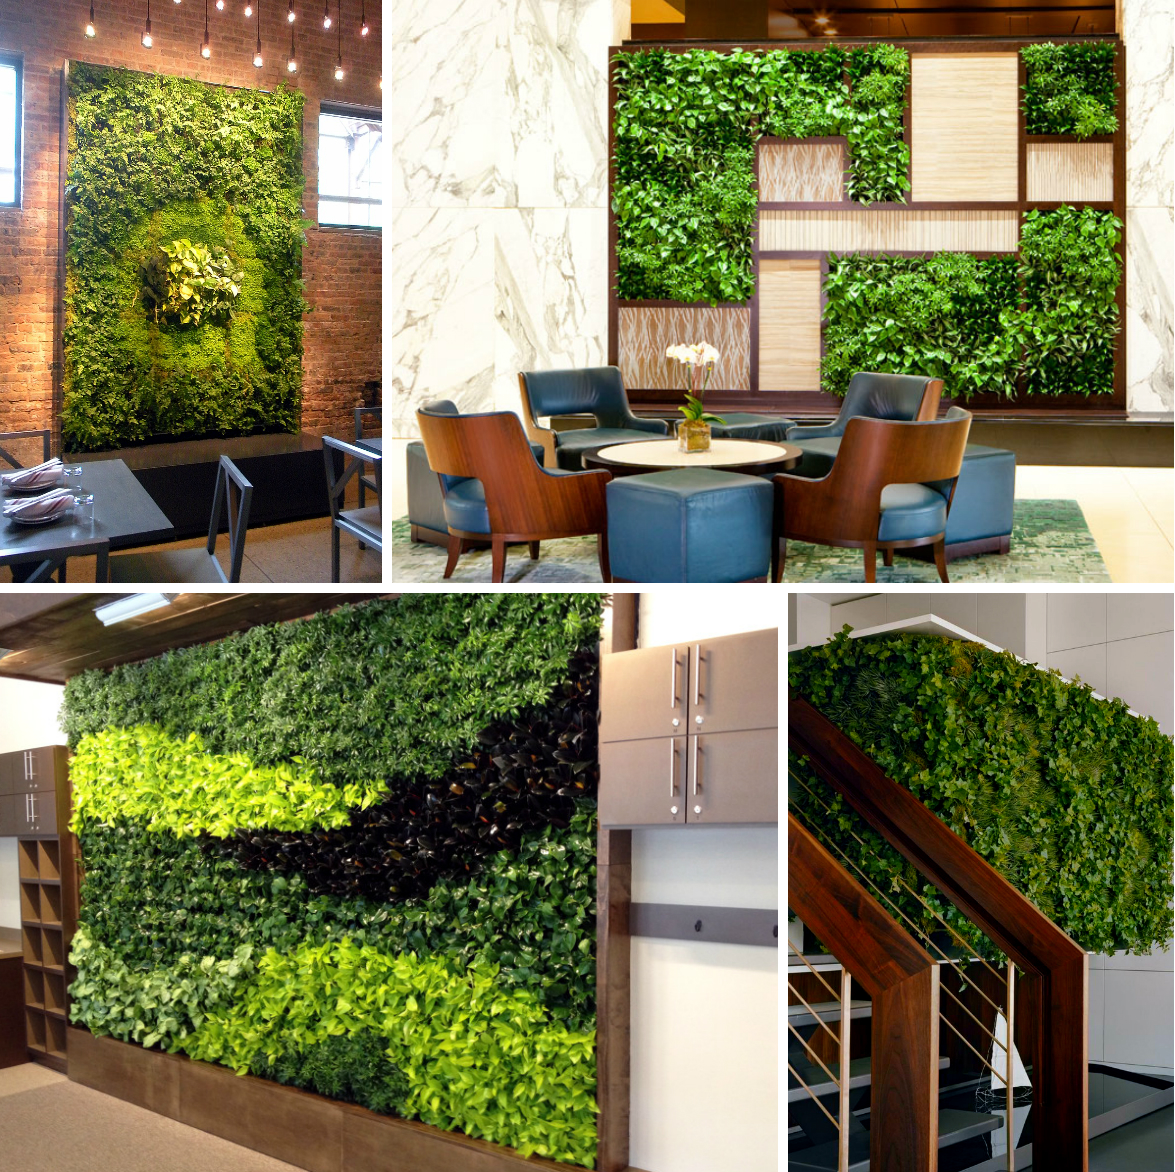 zelenii-zid-green-centar-nis